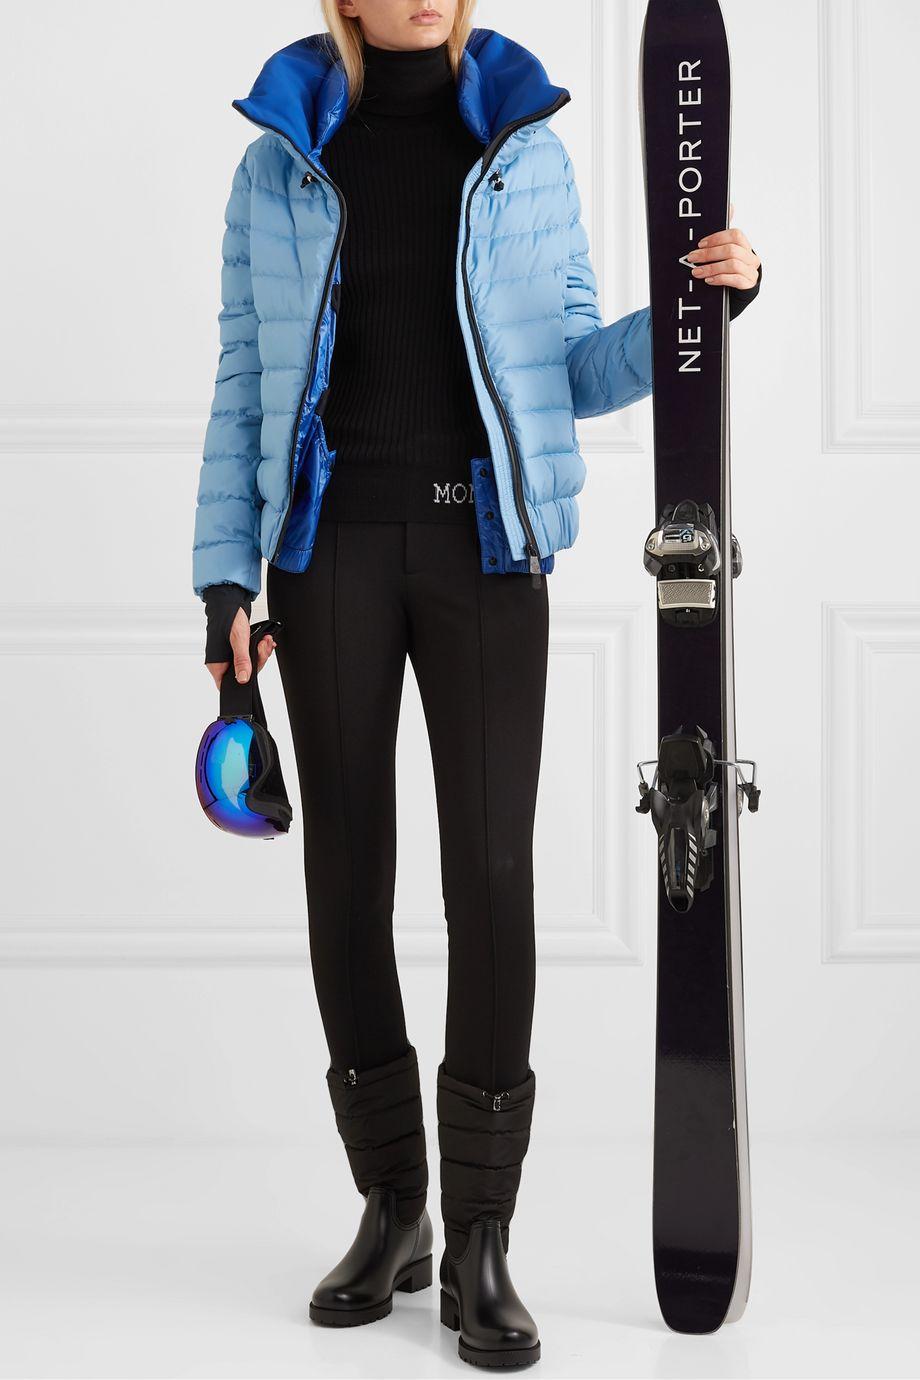 Moncler Grenoble Vonne quilted down ski jacket